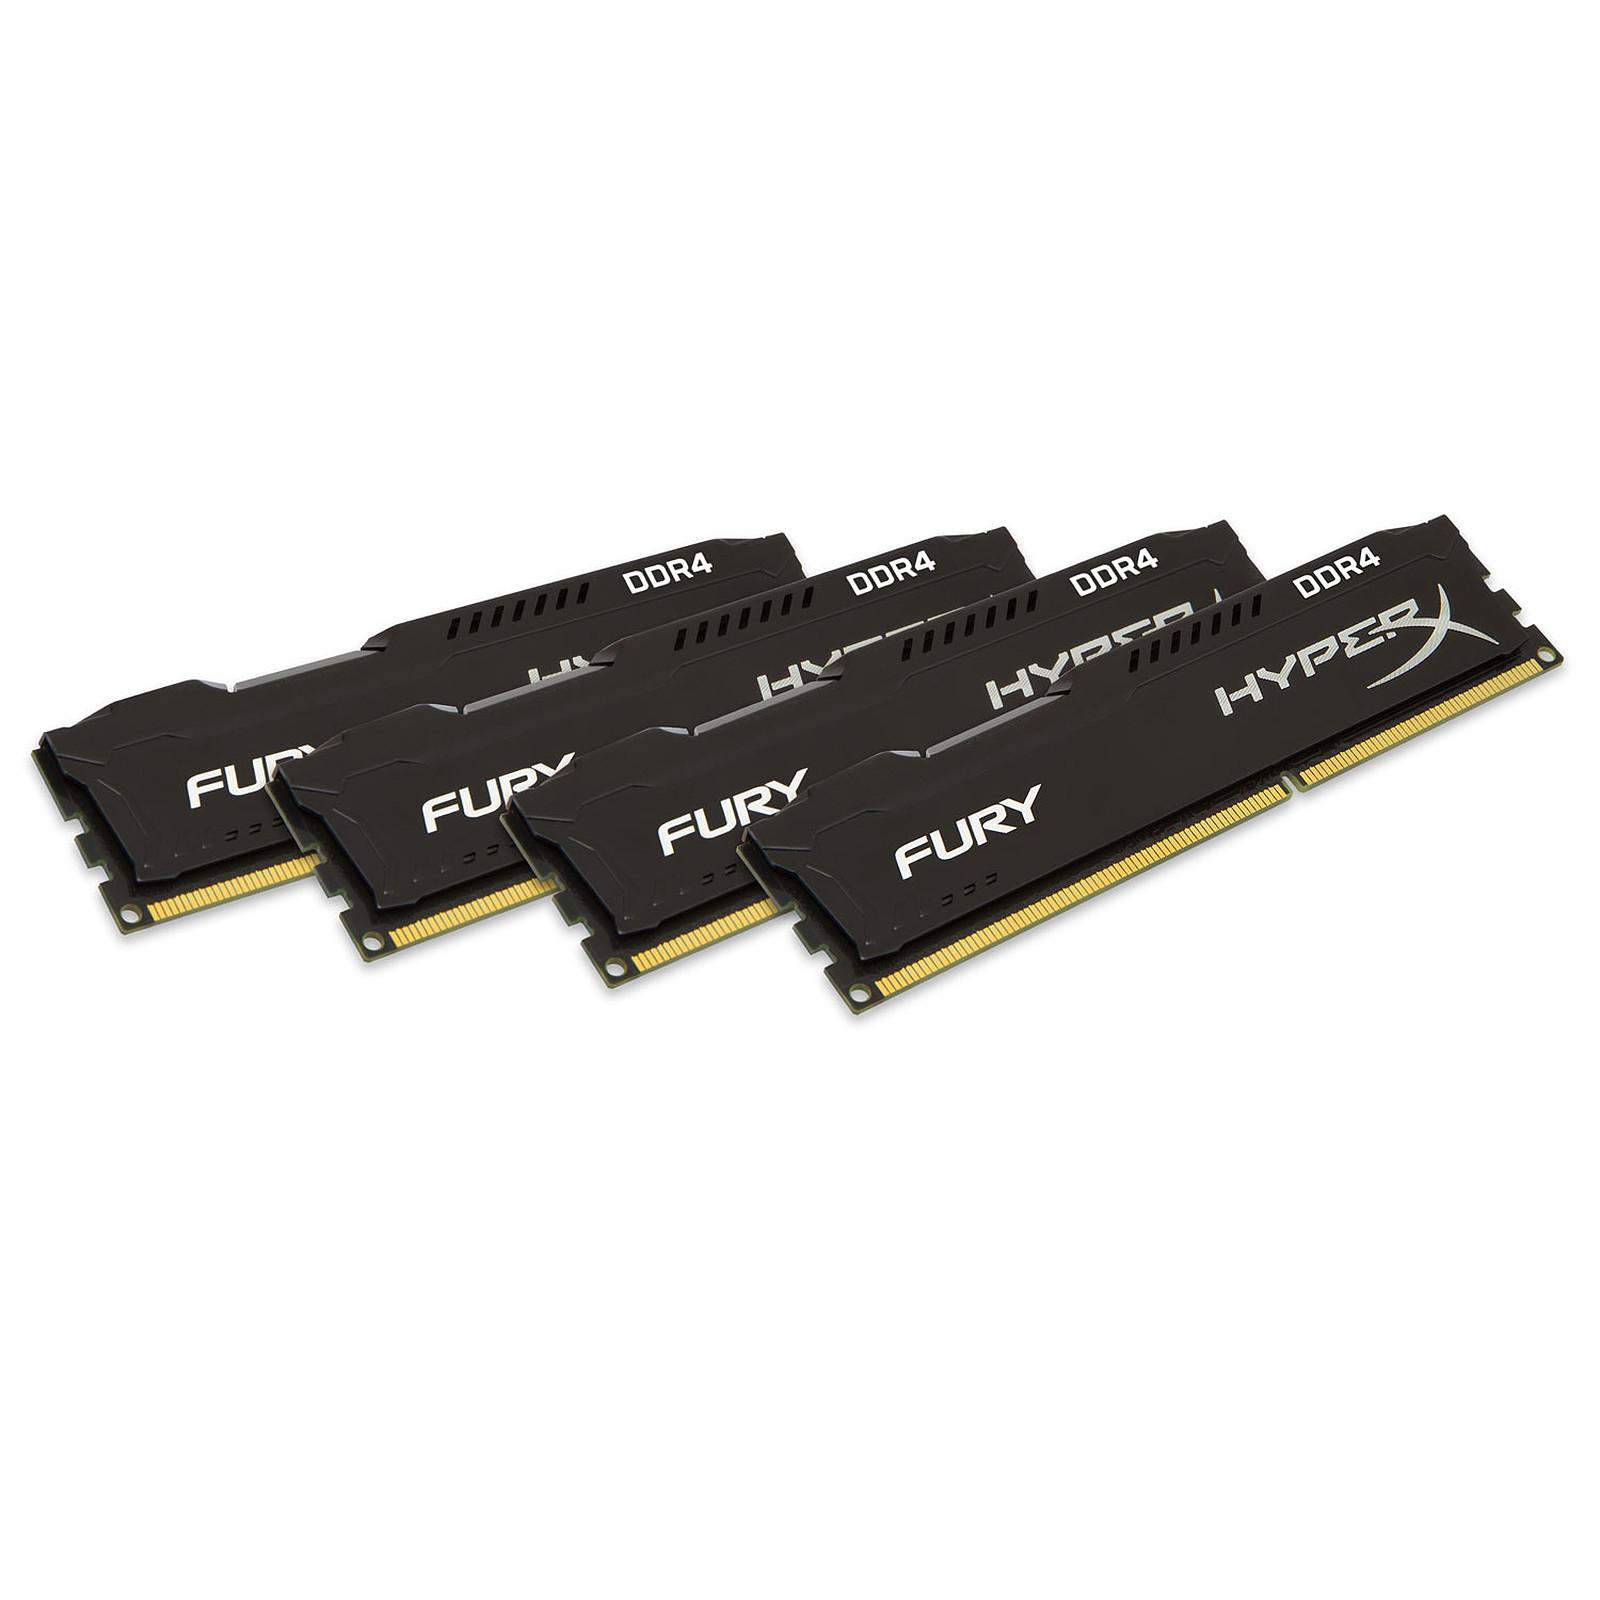 HyperX Fury Noir 64 Go (4x 16 Go) DDR4 2666 MHz CL16